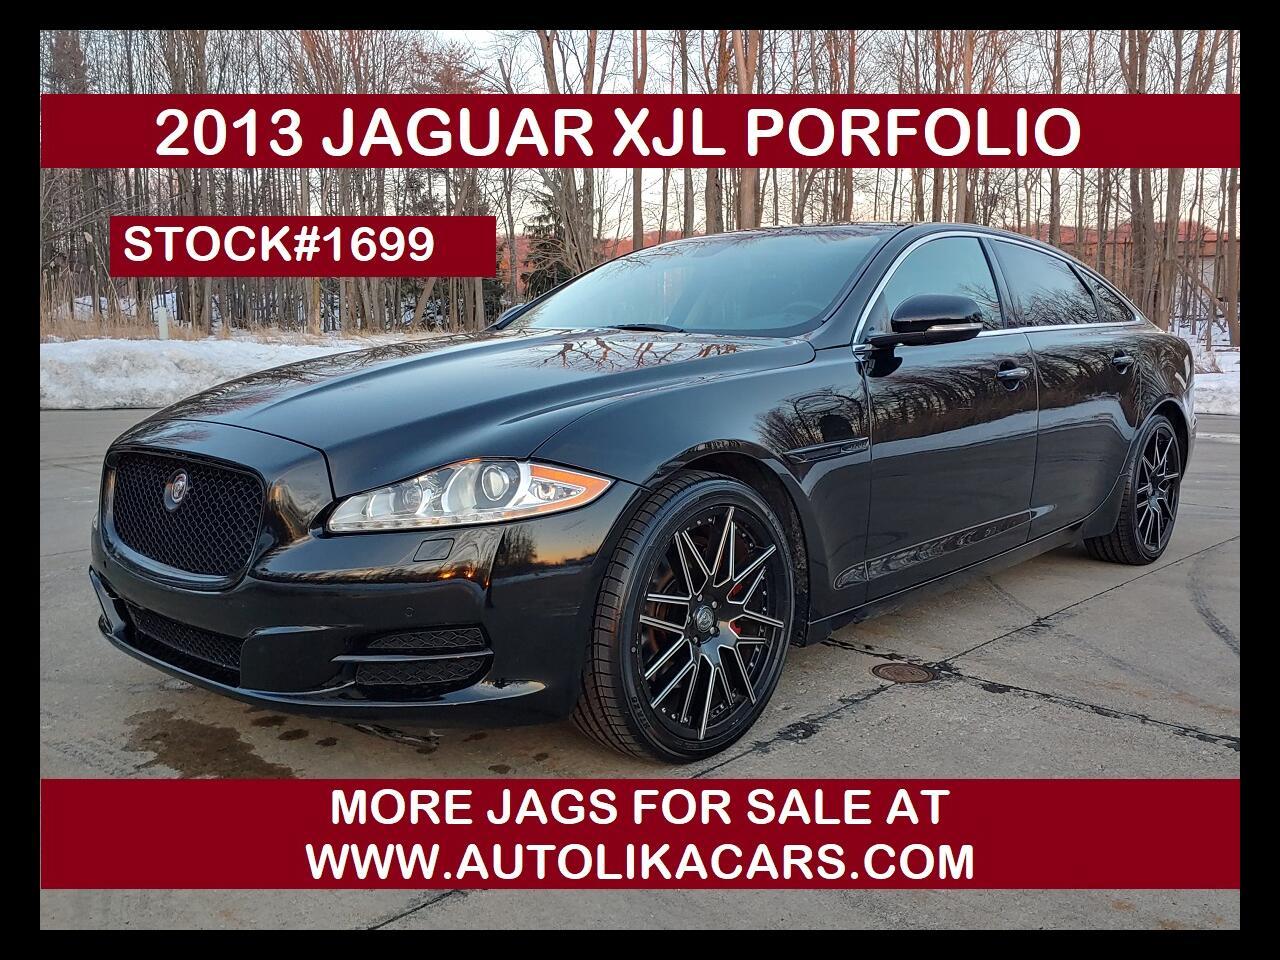 Jaguar XJ 4dr Sdn XJL Portfolio AWD 2013